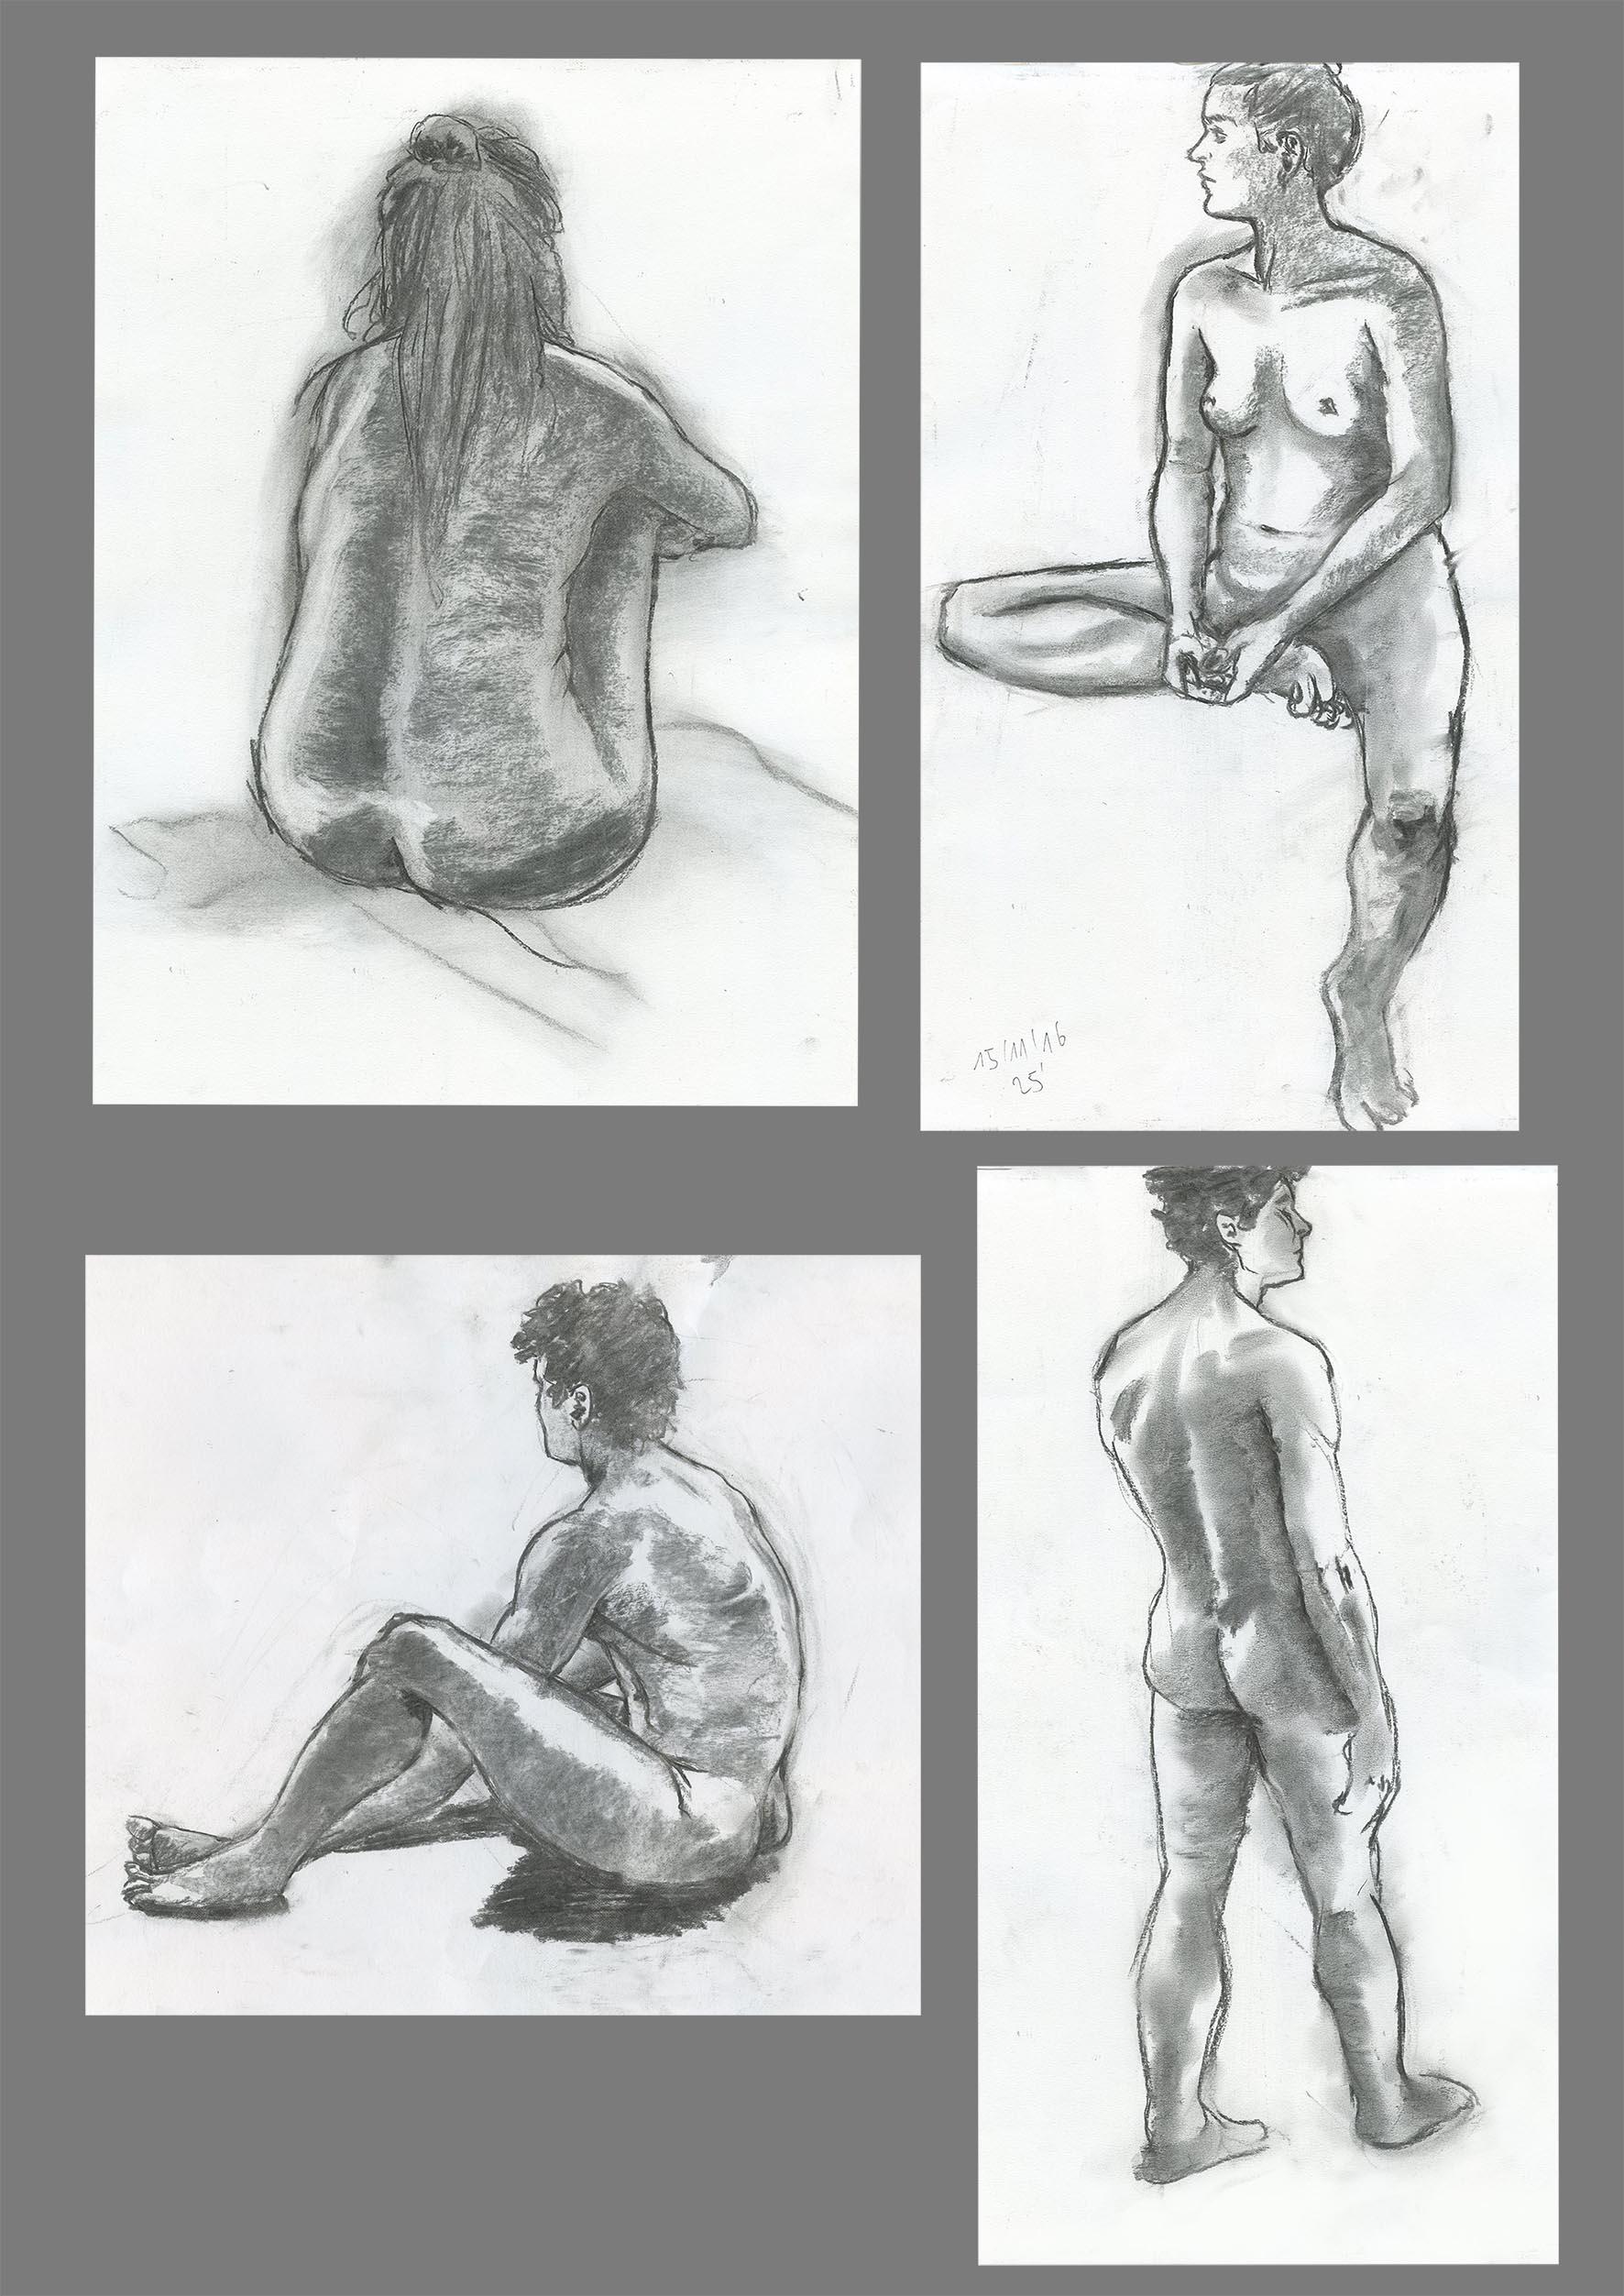 Noomis - Etudes, croquis & Wip [ Nudité ] - Page 7 161128125612336256